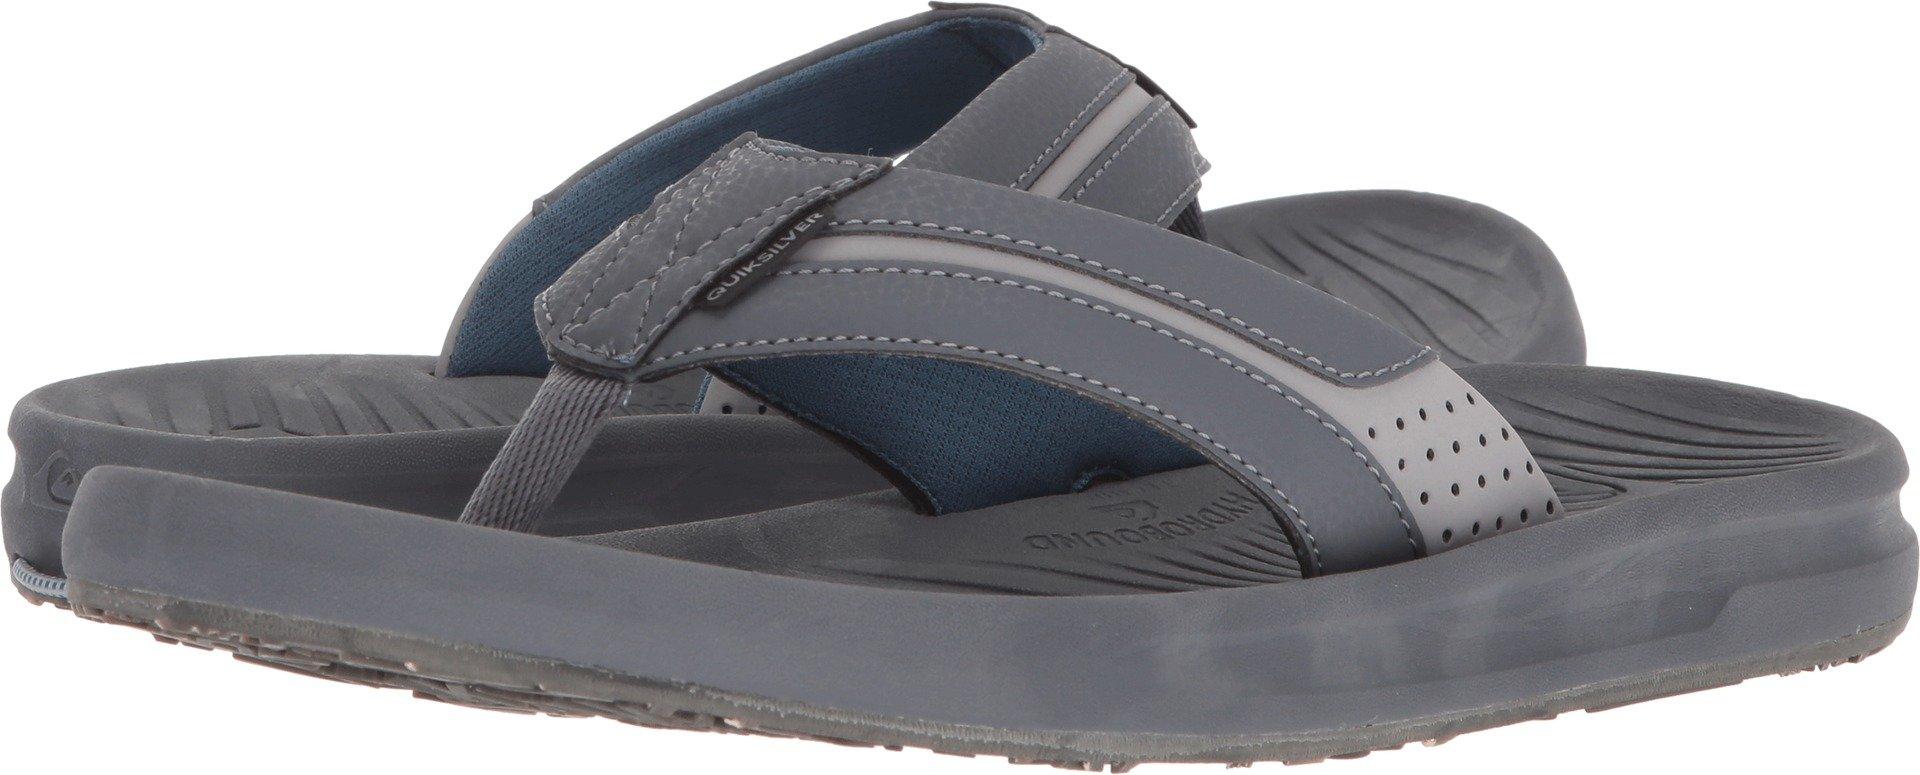 Quiksilver Men's Travel Oasis Sandal, Grey/Brown/Blue, 12 M US